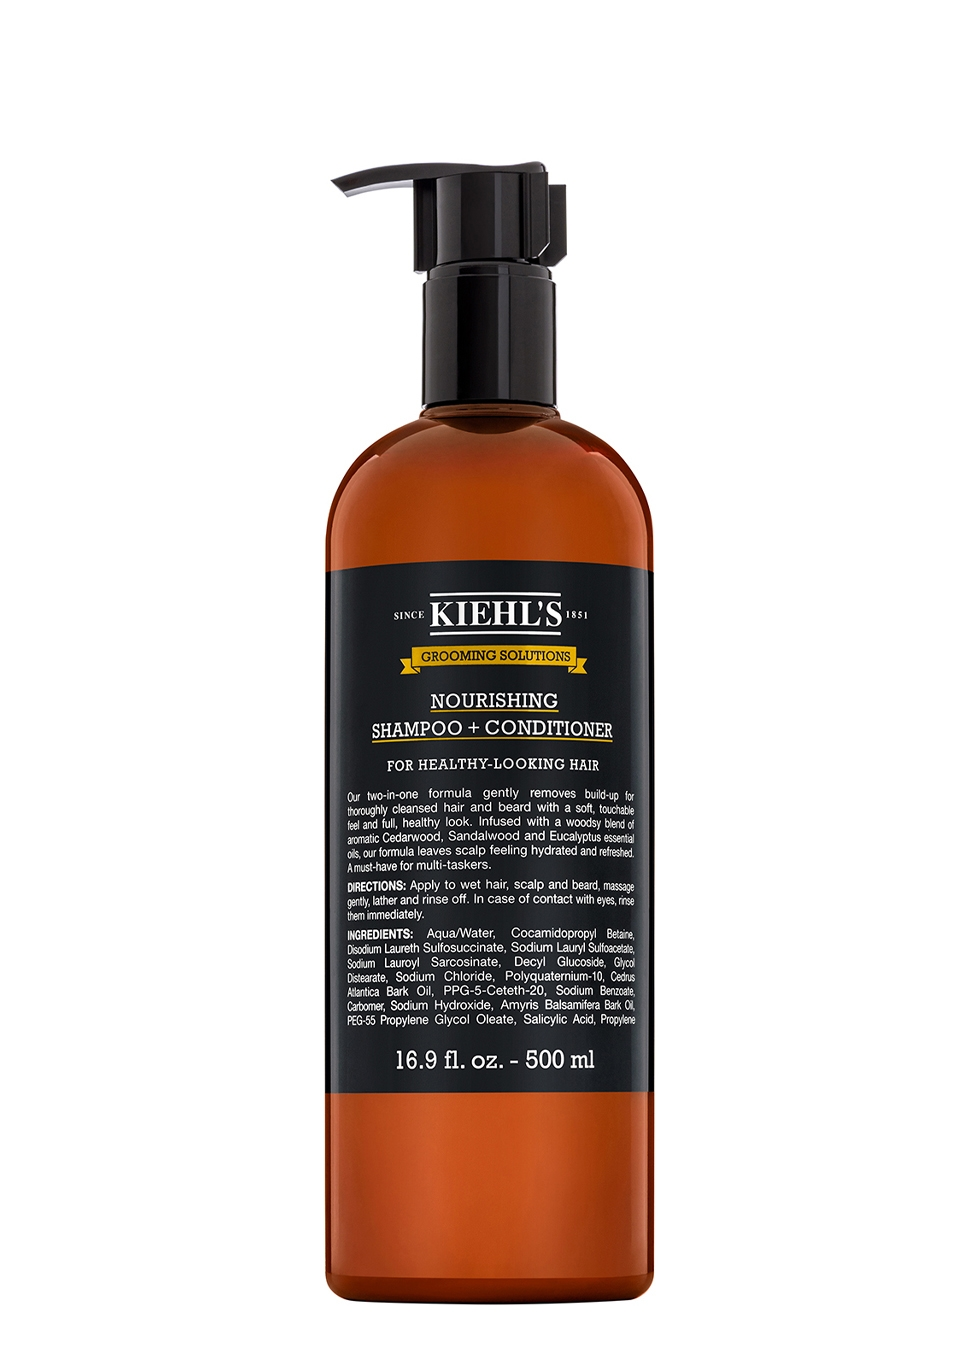 Grooming Solutions Nourishing Shampoo & Conditioner 500ml